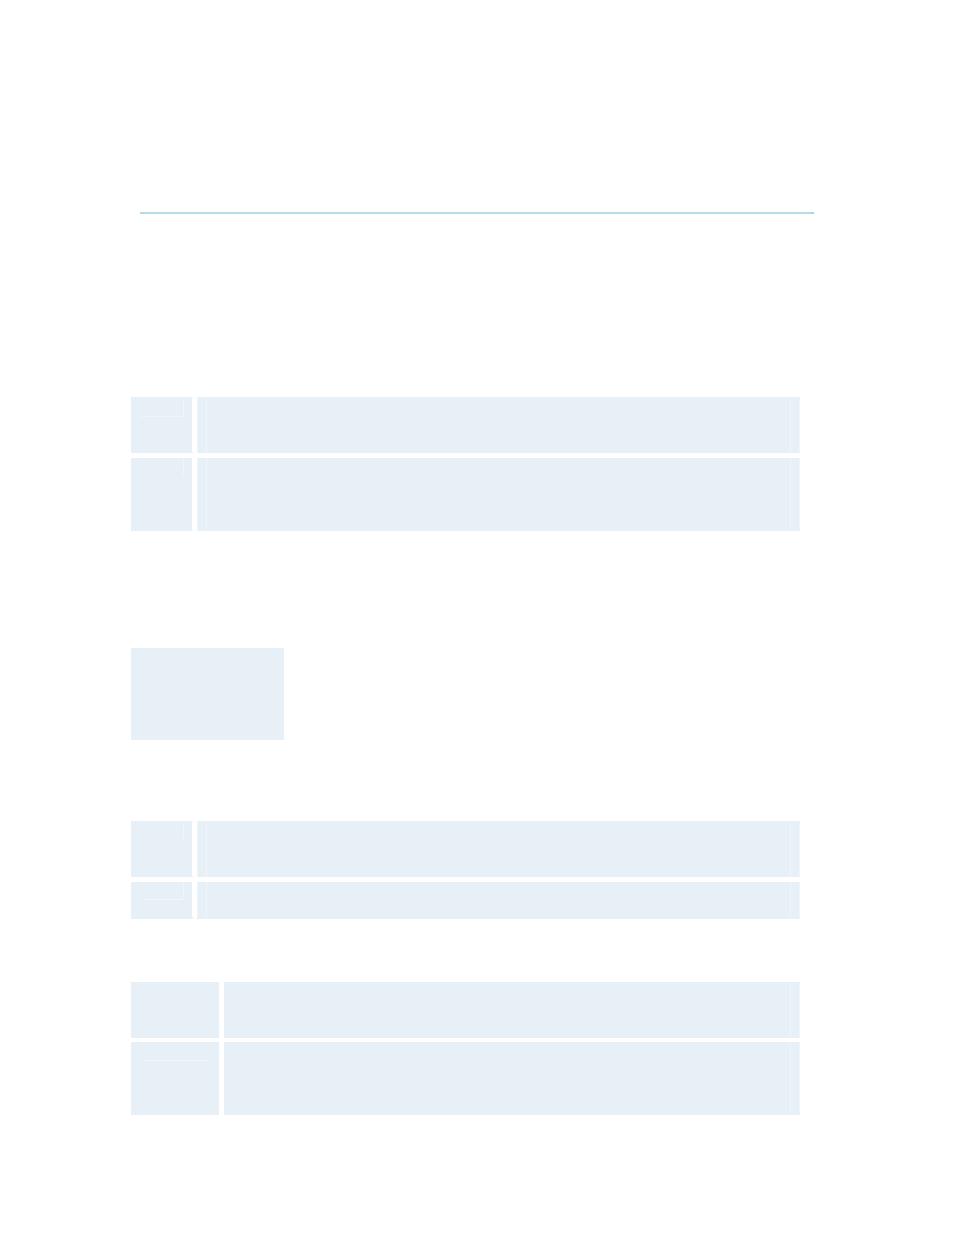 advanced h 323 settings tandberg 880 mxp user manual page 217 rh manualsdir com Tandberg 770 MXP Tandberg MXP 550